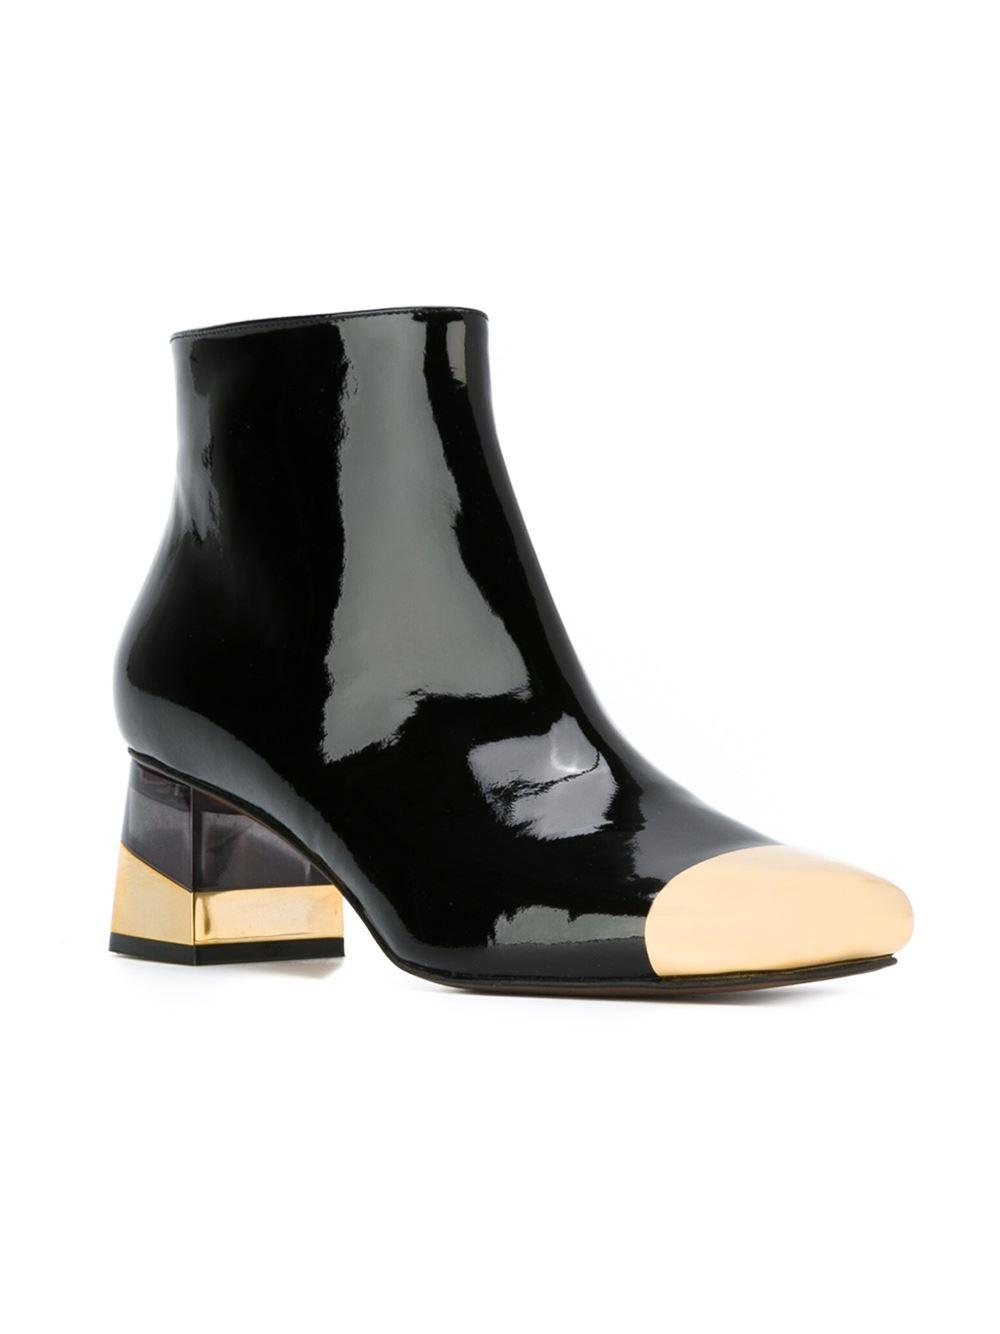 L\'autre chose Ankle Boots in Black | Lyst